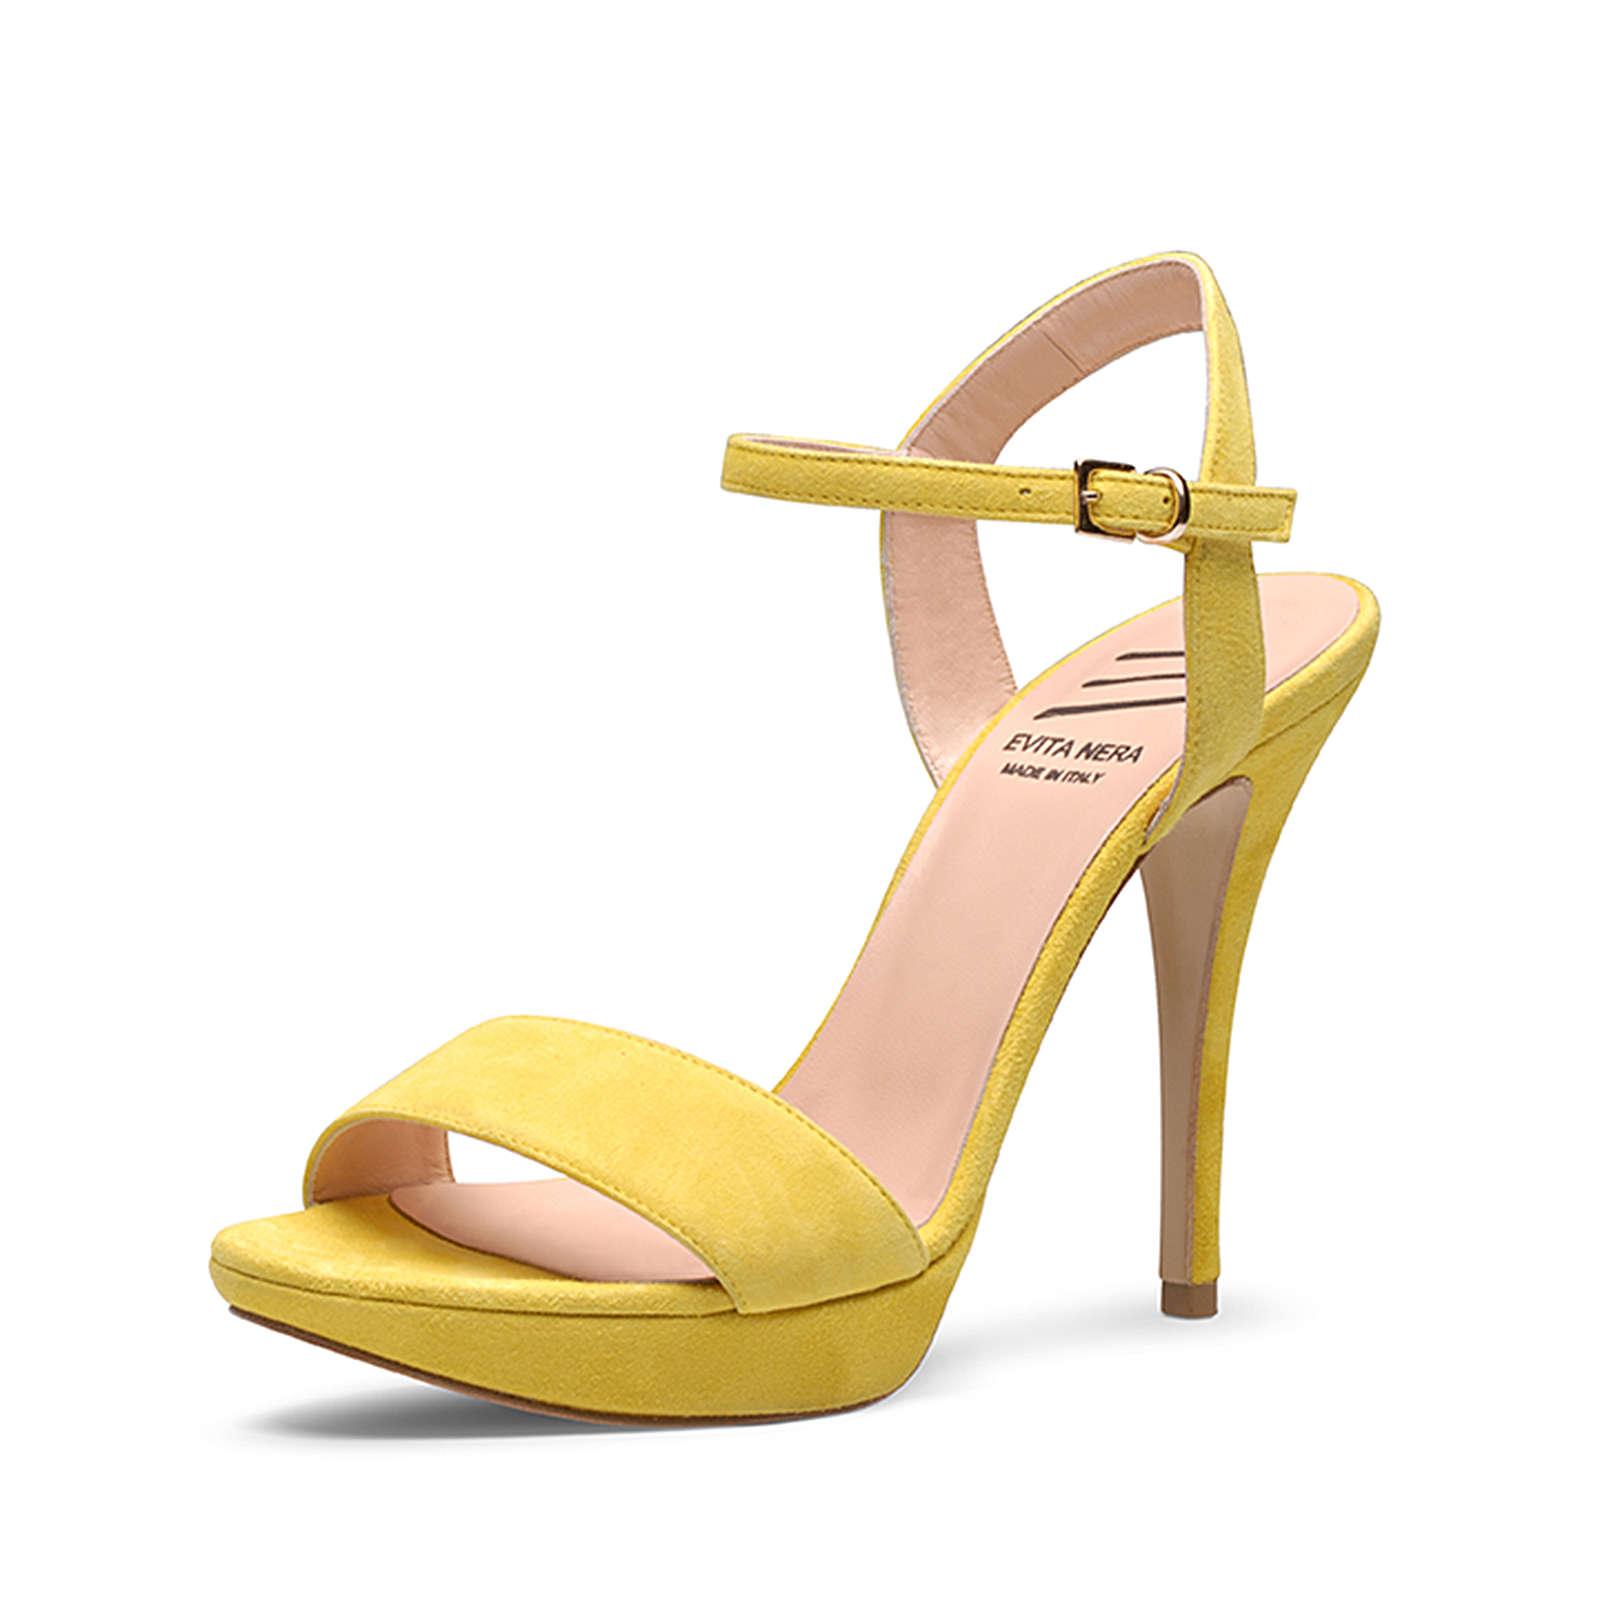 Evita Shoes Sandaletten gelb Damen Gr. 42